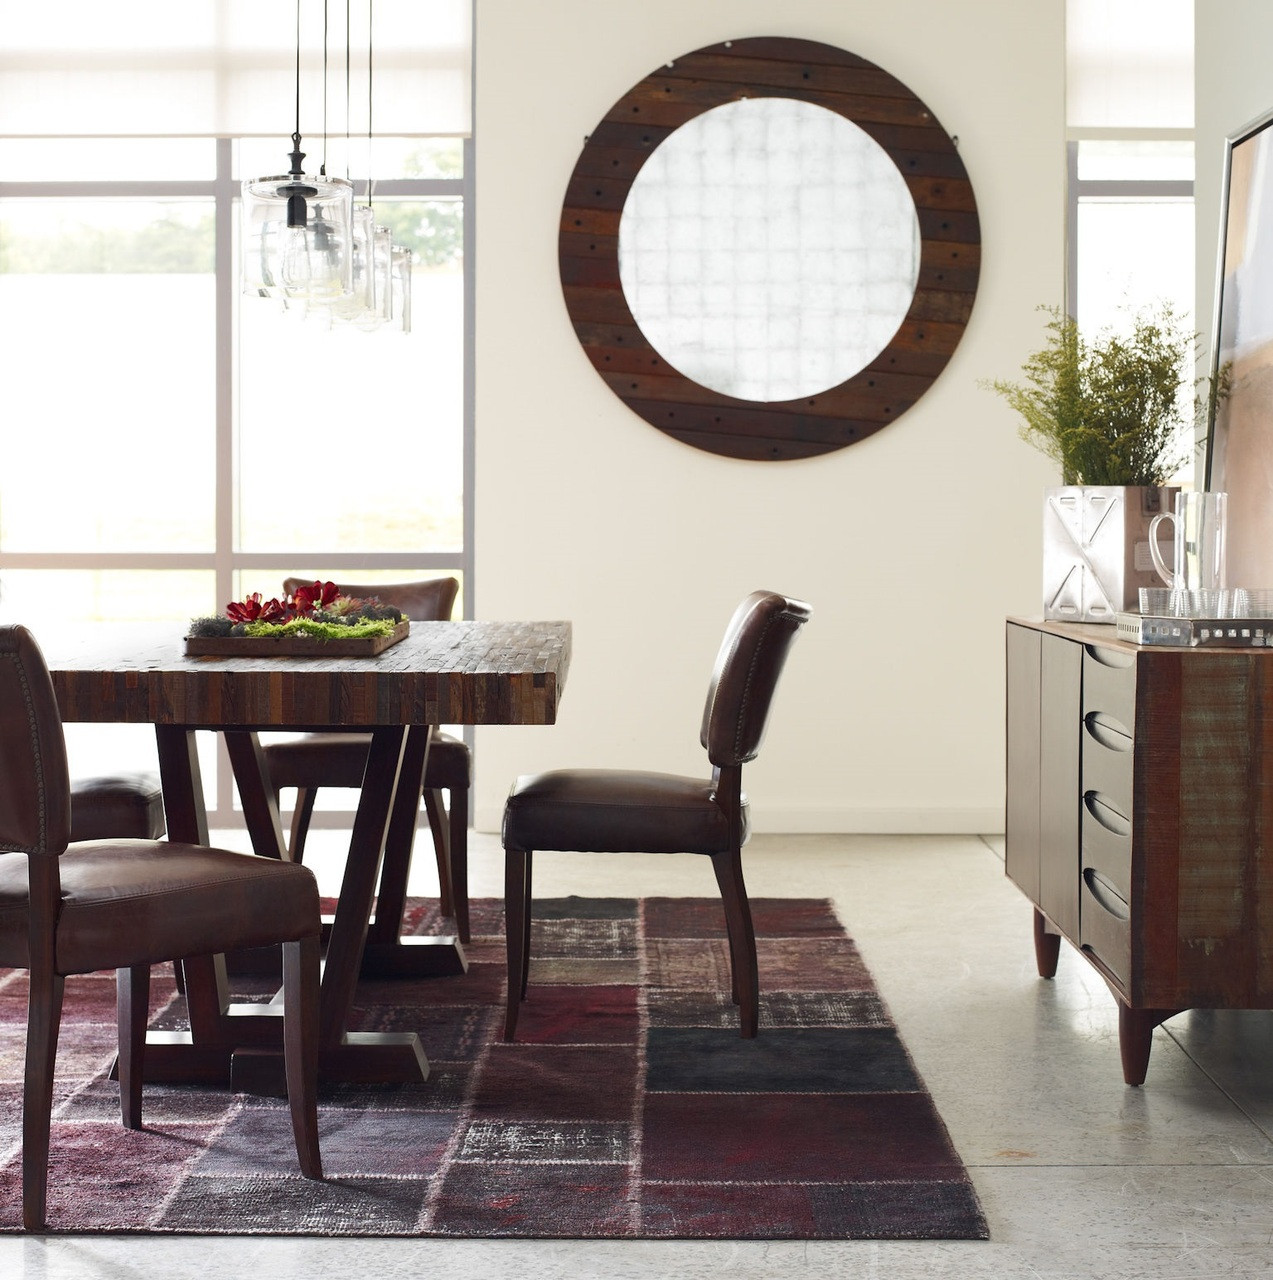 mimi biker tan brown leather dining chairs